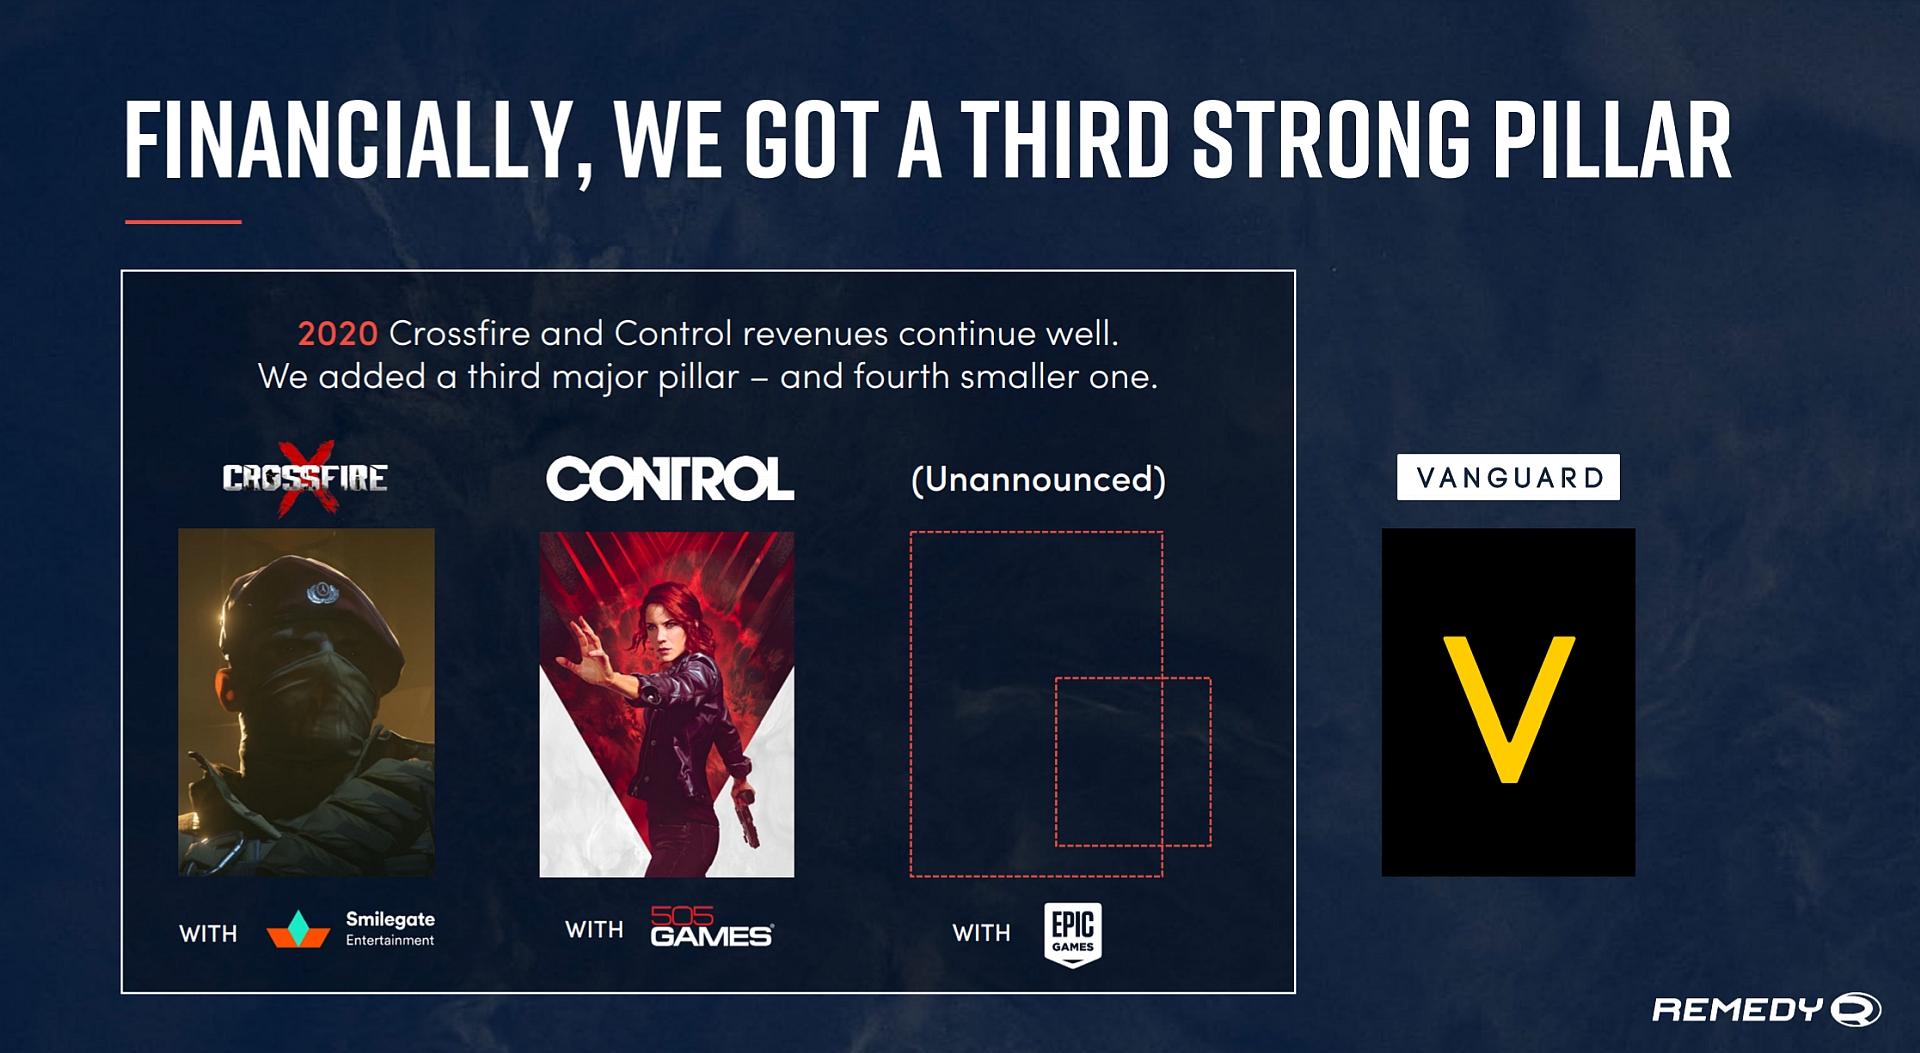 Remedy公布多人游戏《Vanguard》和未公布两个游戏的细节